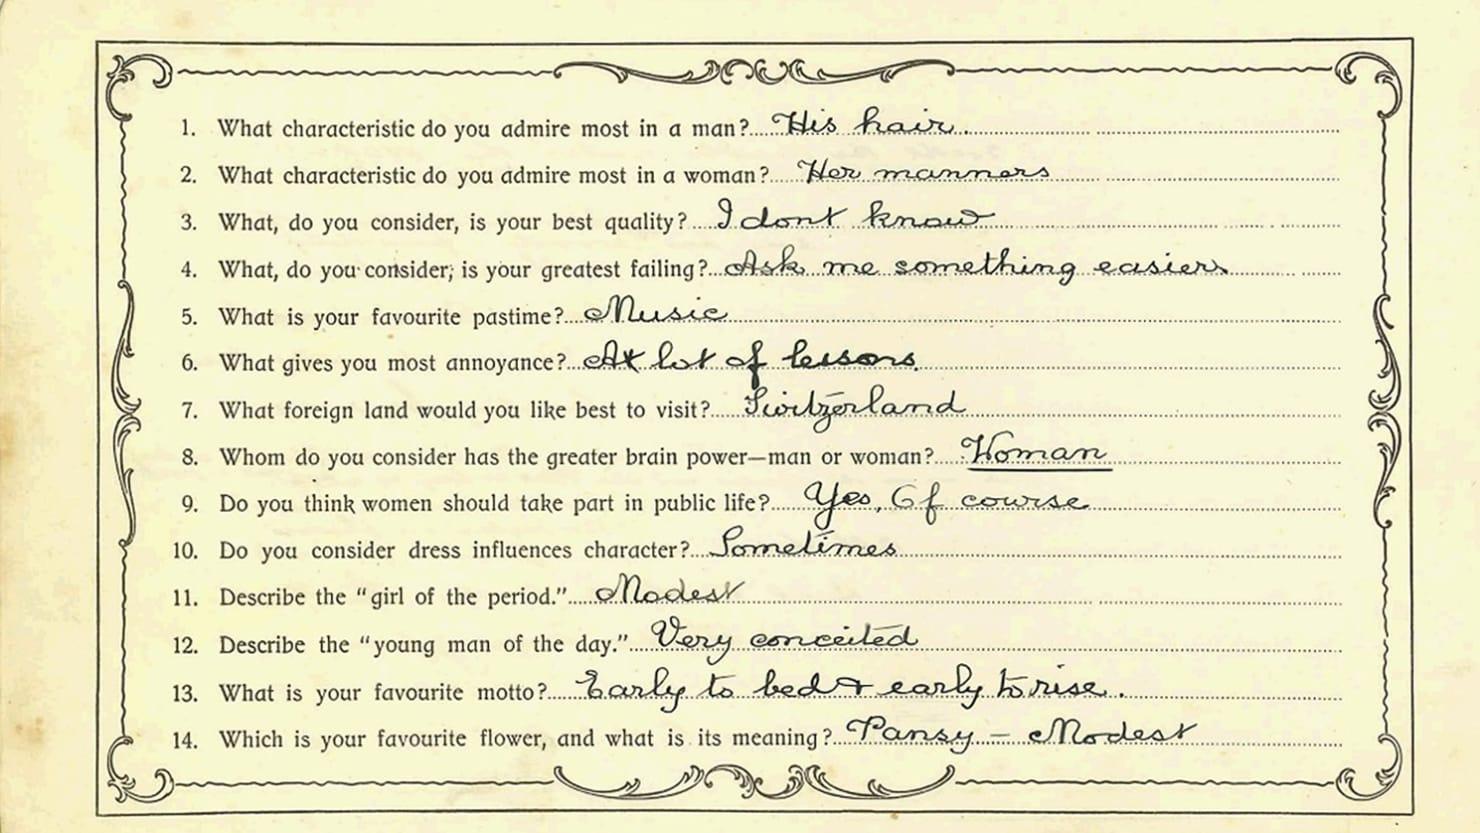 Autograph Book Image questions 1-14